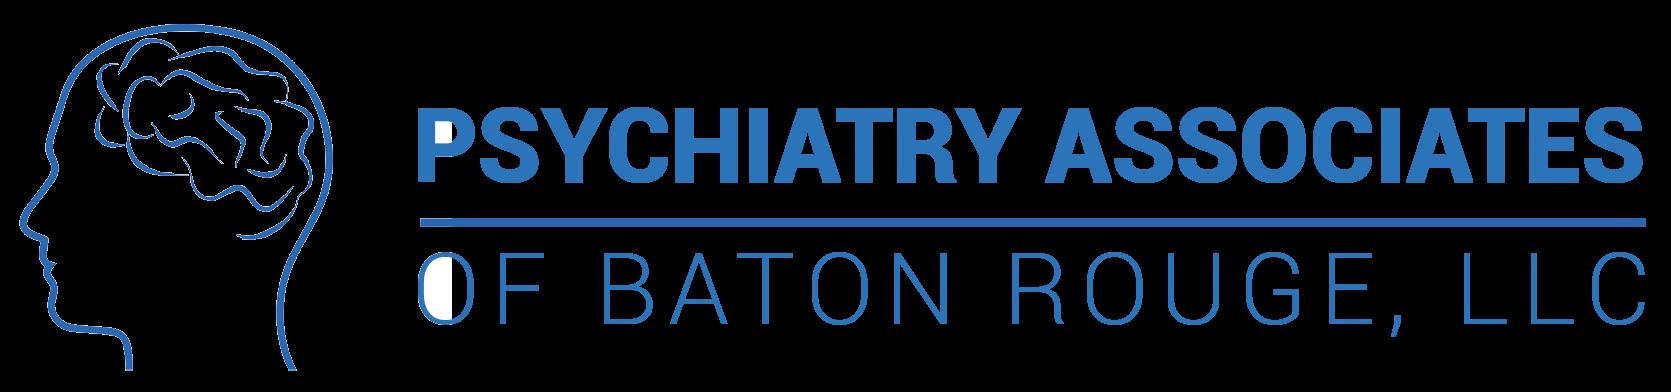 PsychiatryAssociatesofBatonRouge.png